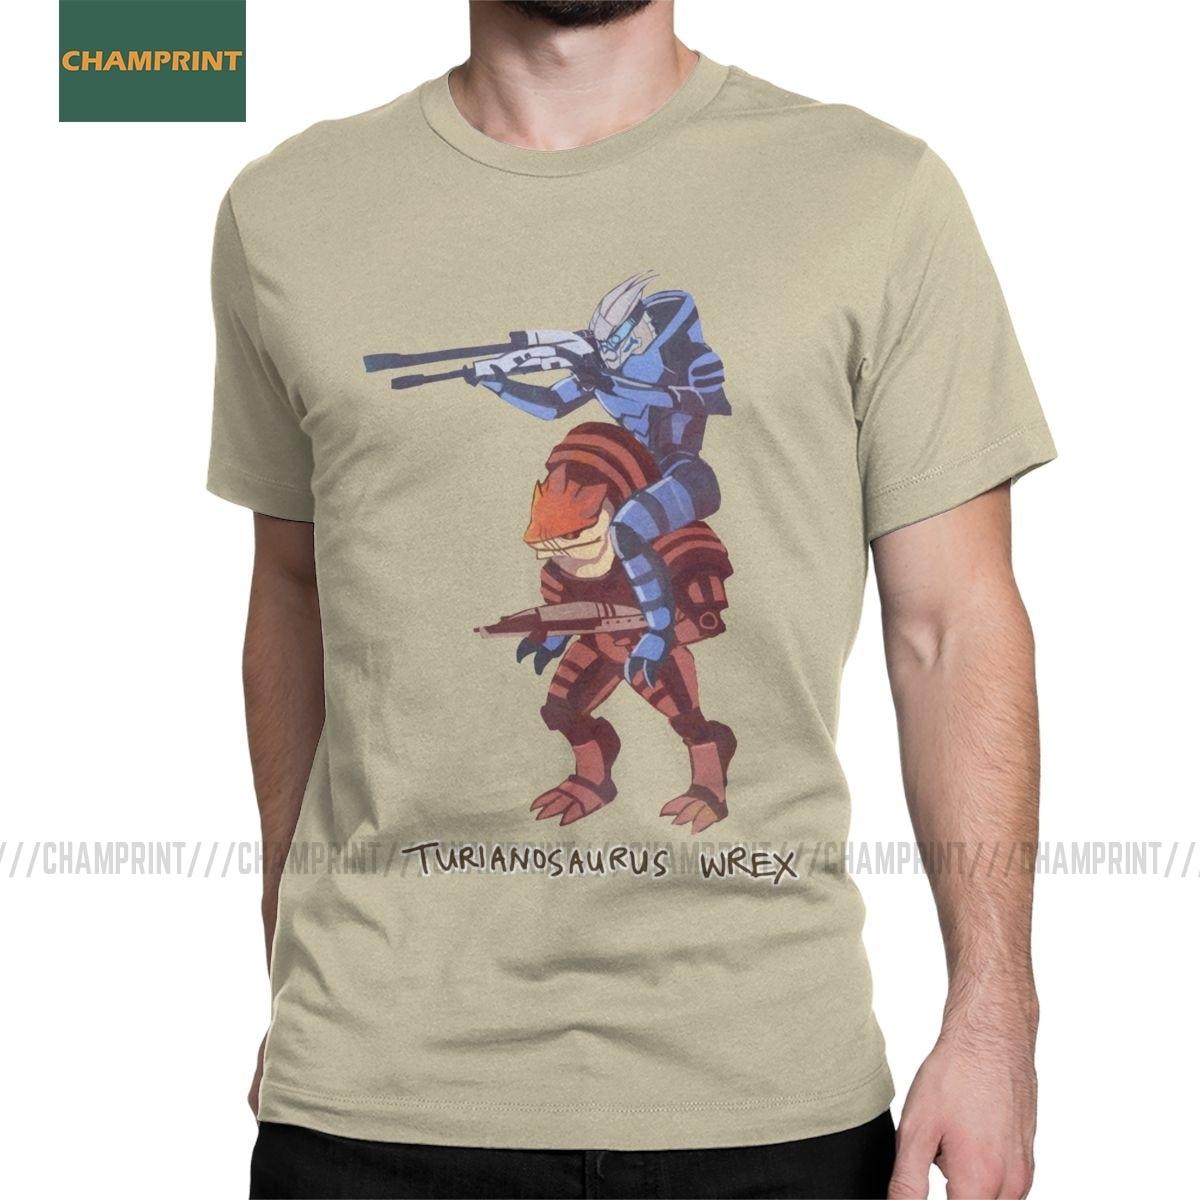 Turianosaurus Wrex Mass Effect Mens T Shirt Garrus Commander Reapers Mordin Game Tees Short Sleeve T-Shirts Cotton 4XL 5XL Tops